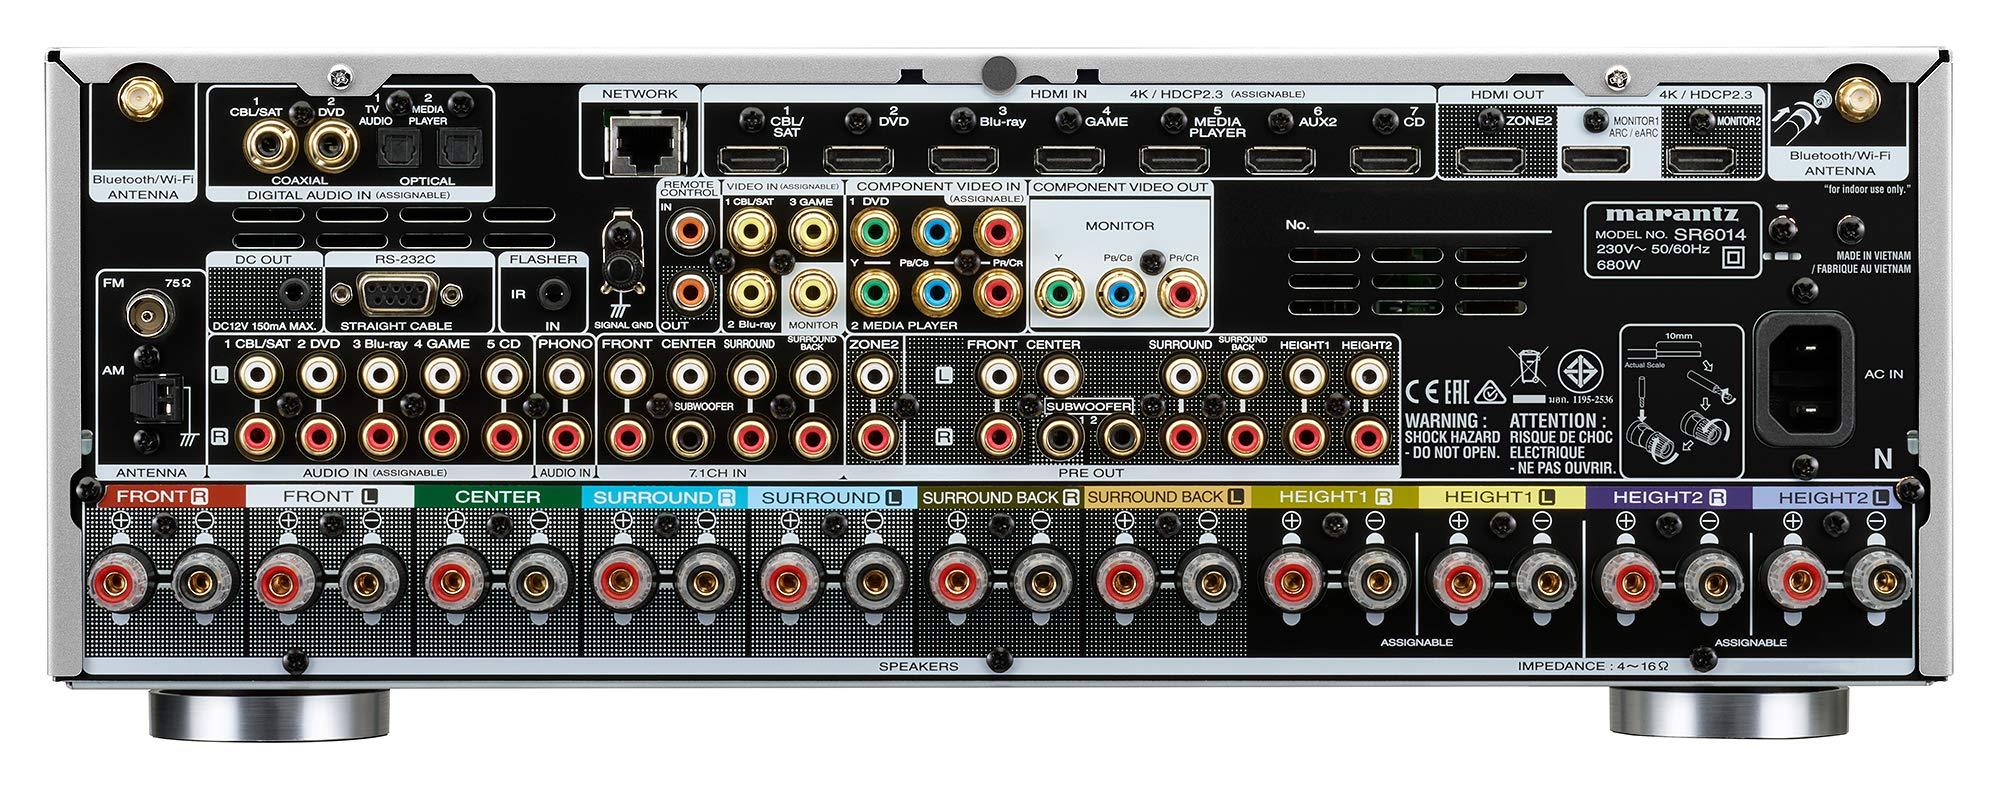 WLAN Y Heos Receptor AV Marantz Sr6014 9.2 Plata//Oro con Bluetooth Marantz Deutschland